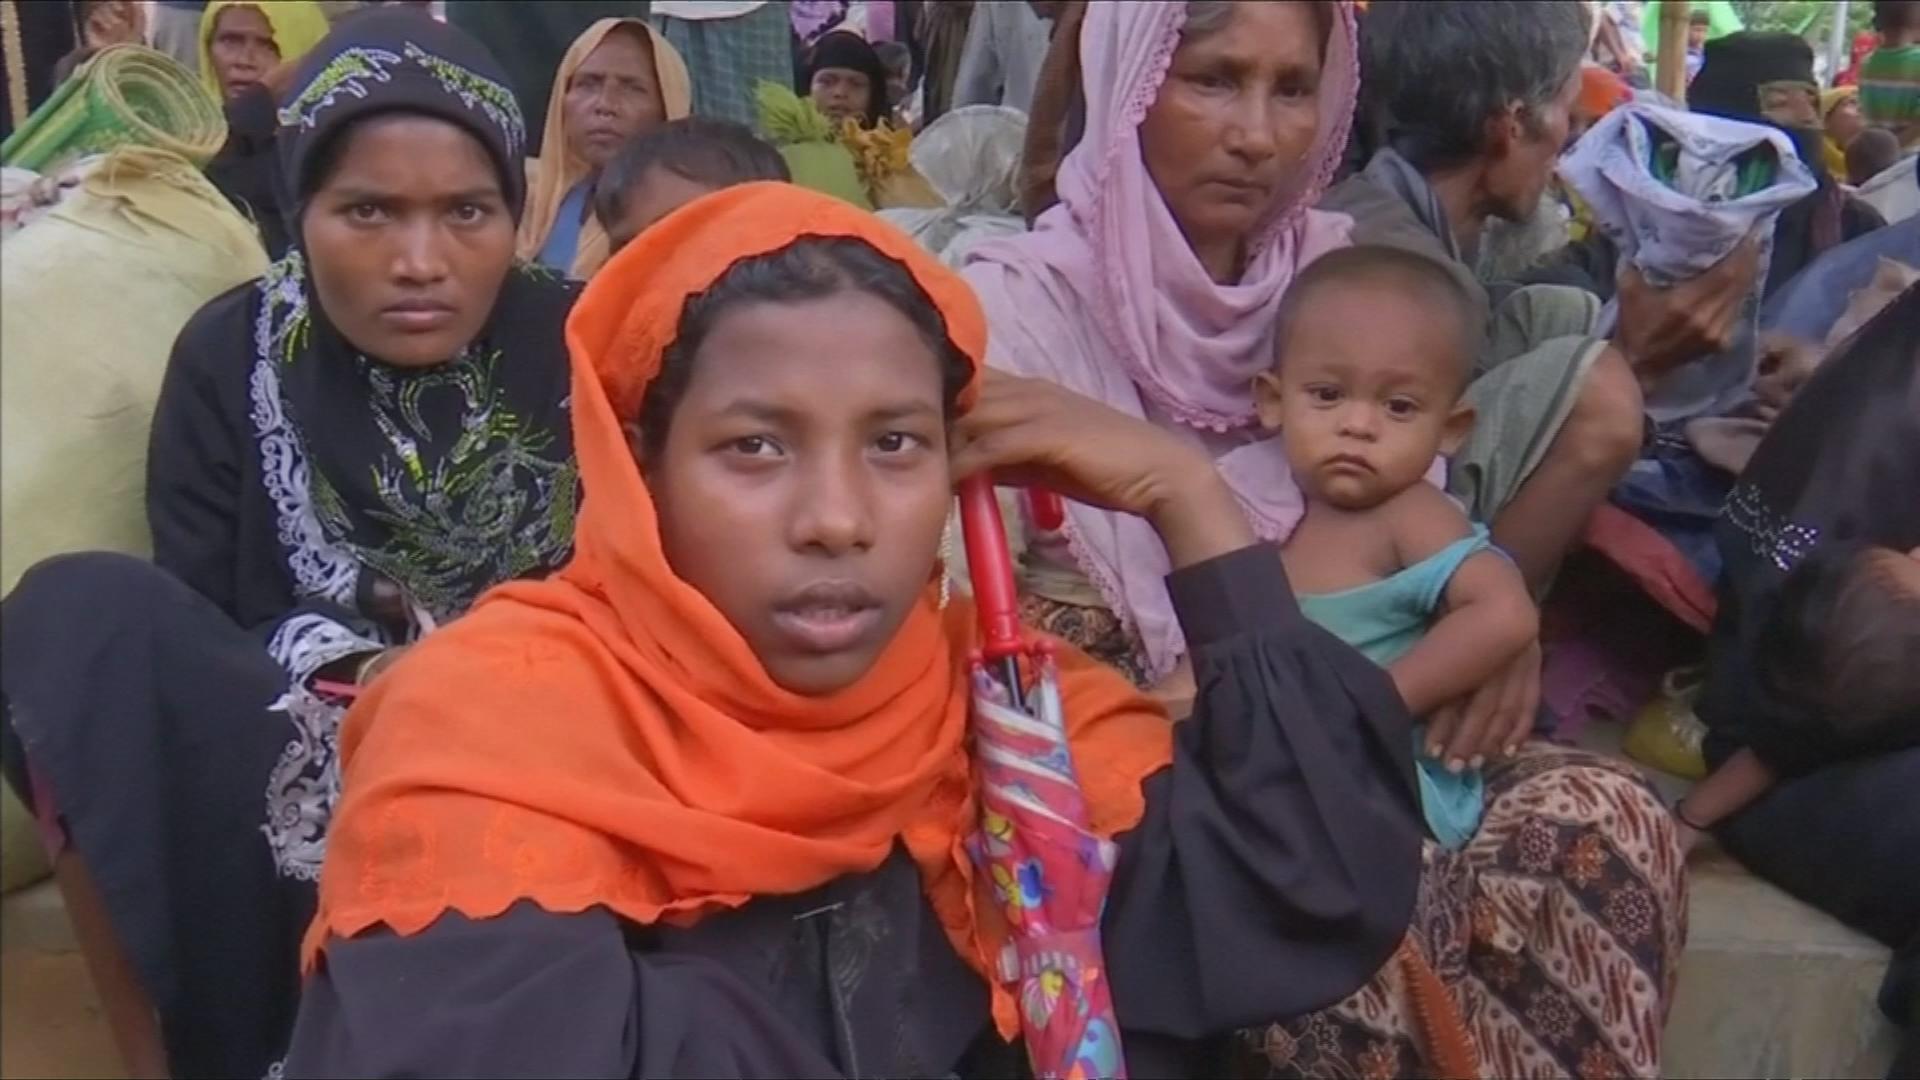 At least 18,000 Rohingya flee to Bangladesh from Myanmar